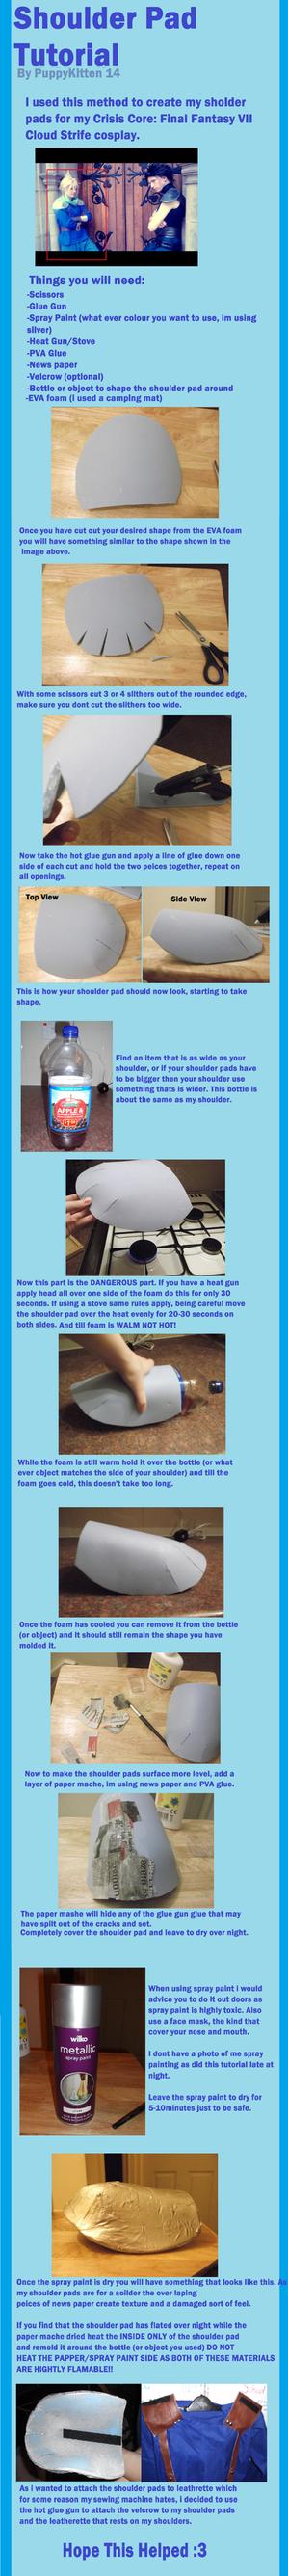 Shoulder Pad Tutorial by BluePandaCosplay